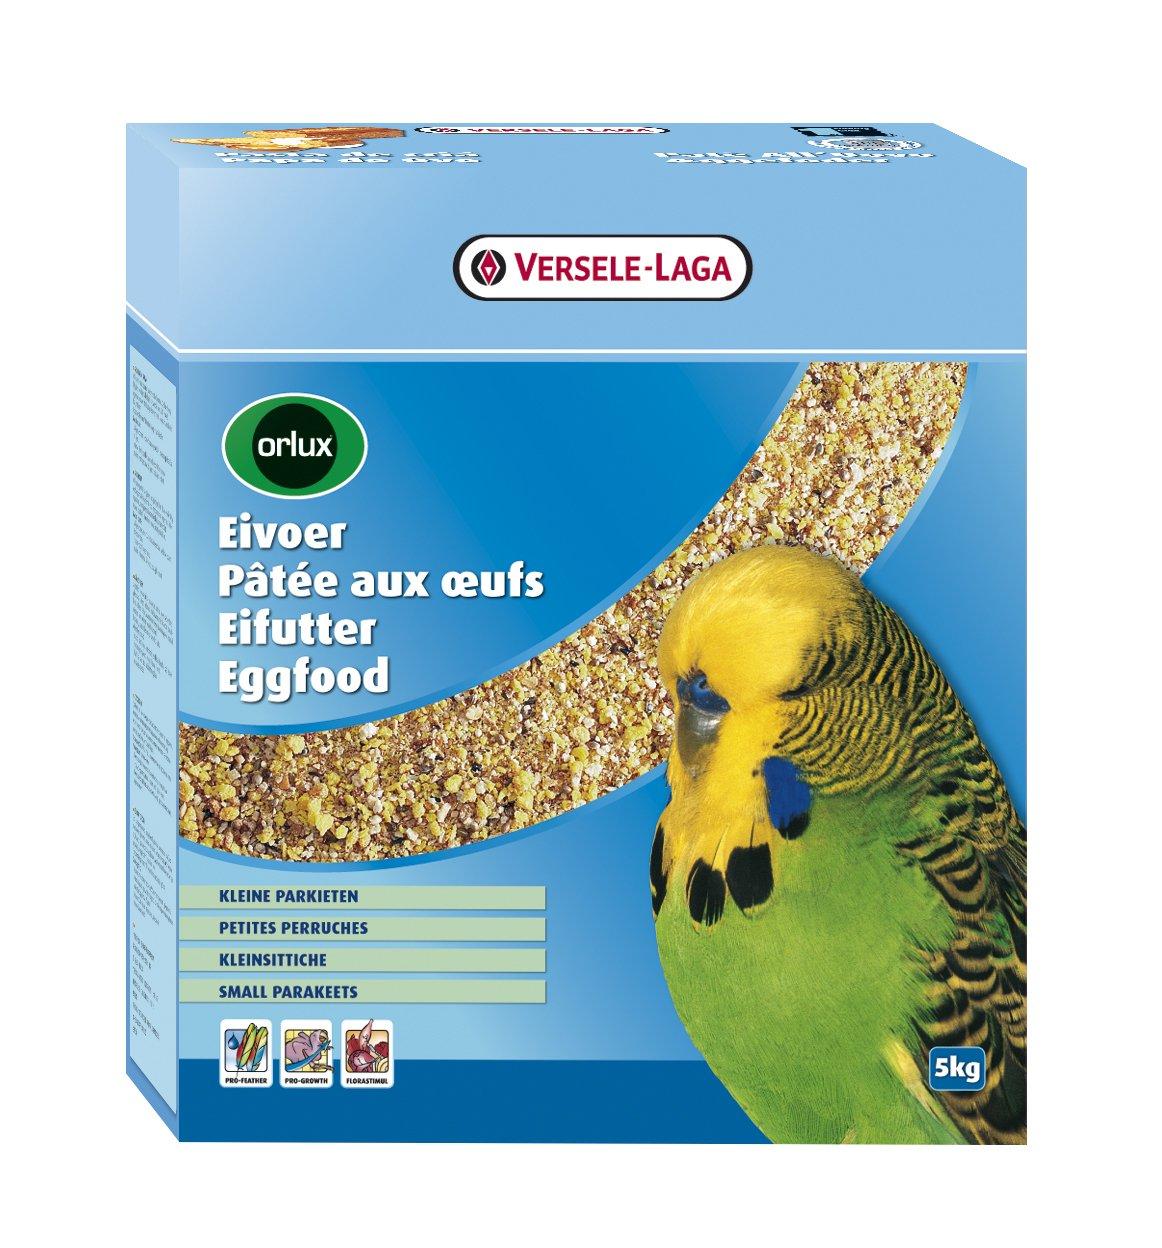 Prestige Versele Laga Eggfood Dry For Budgies / Parakeets 5Kg